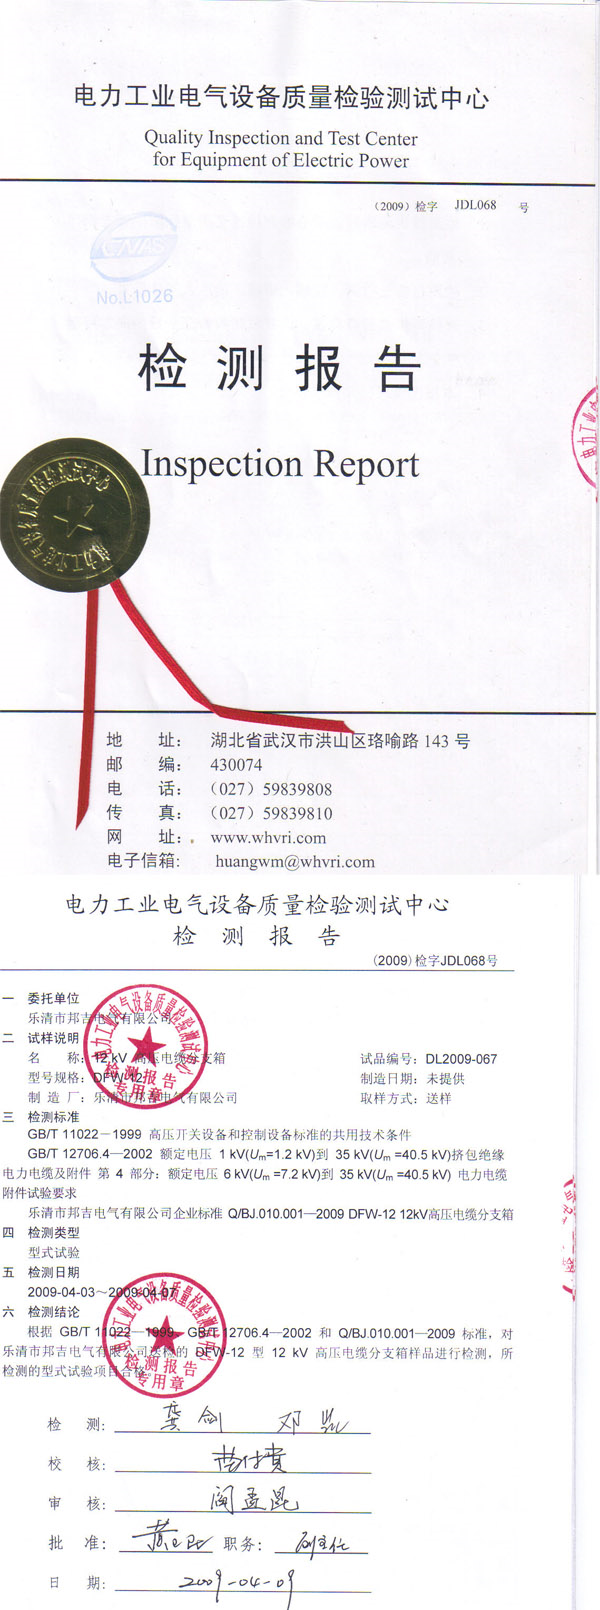 http://www.zjbjdq.cn/upLoad/album/month_1710/201710181625188547.png